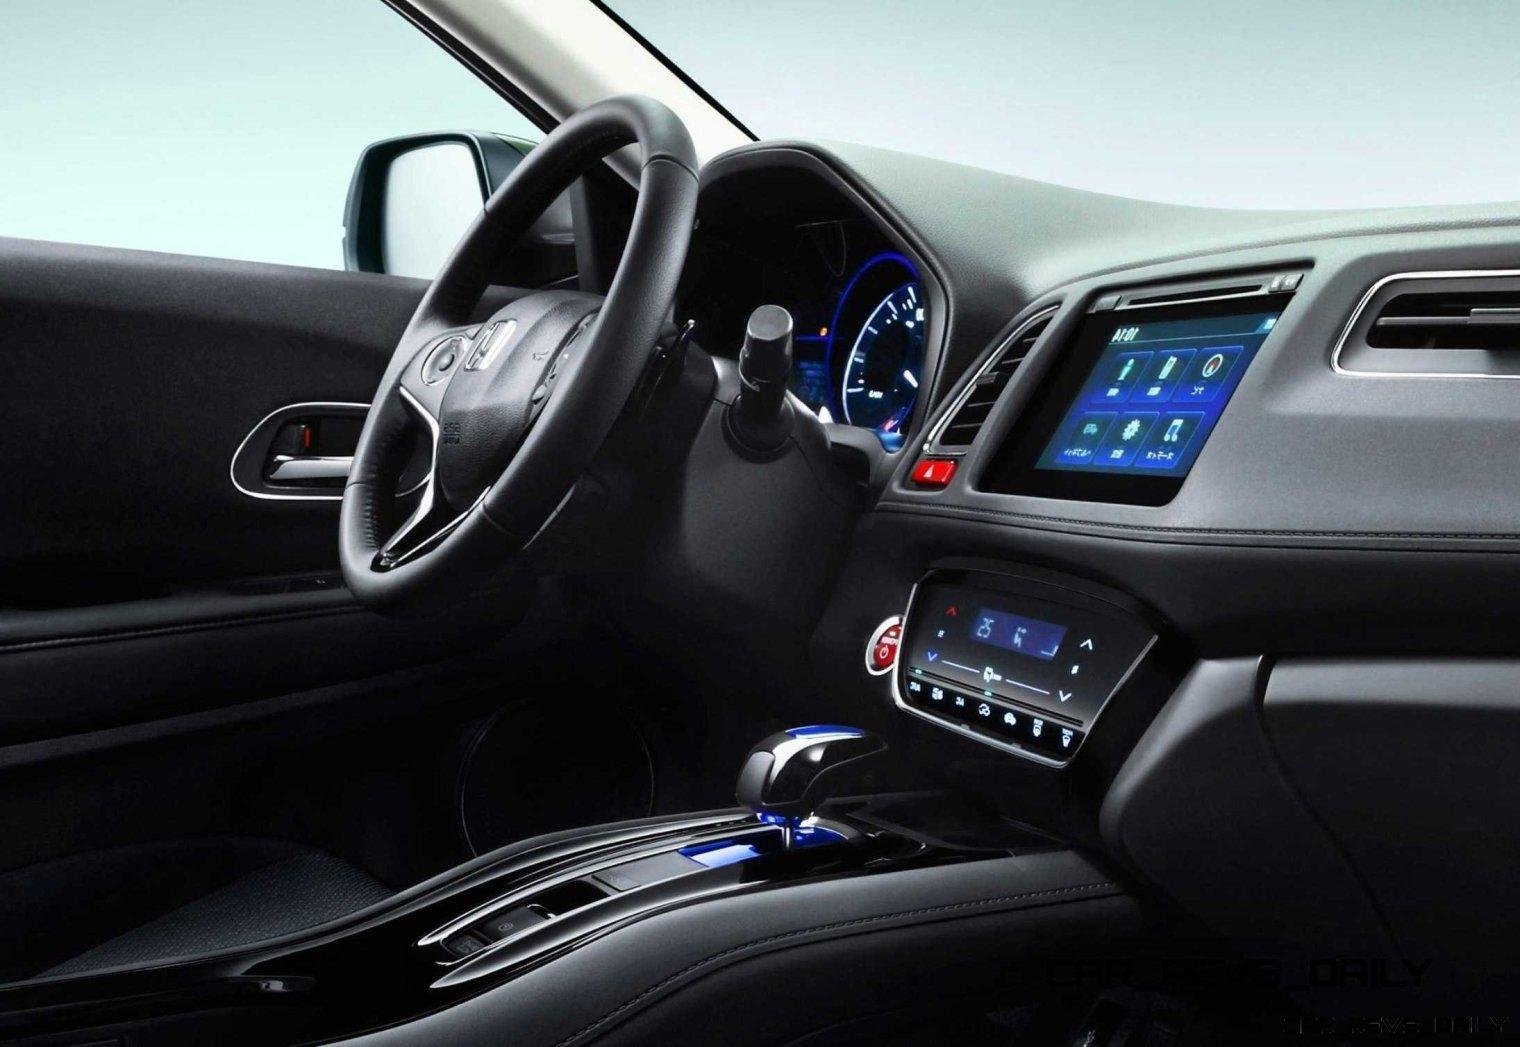 Cool! 2015 Honda Vezel Hybrid Previews Spring 2014 Civic CUV19